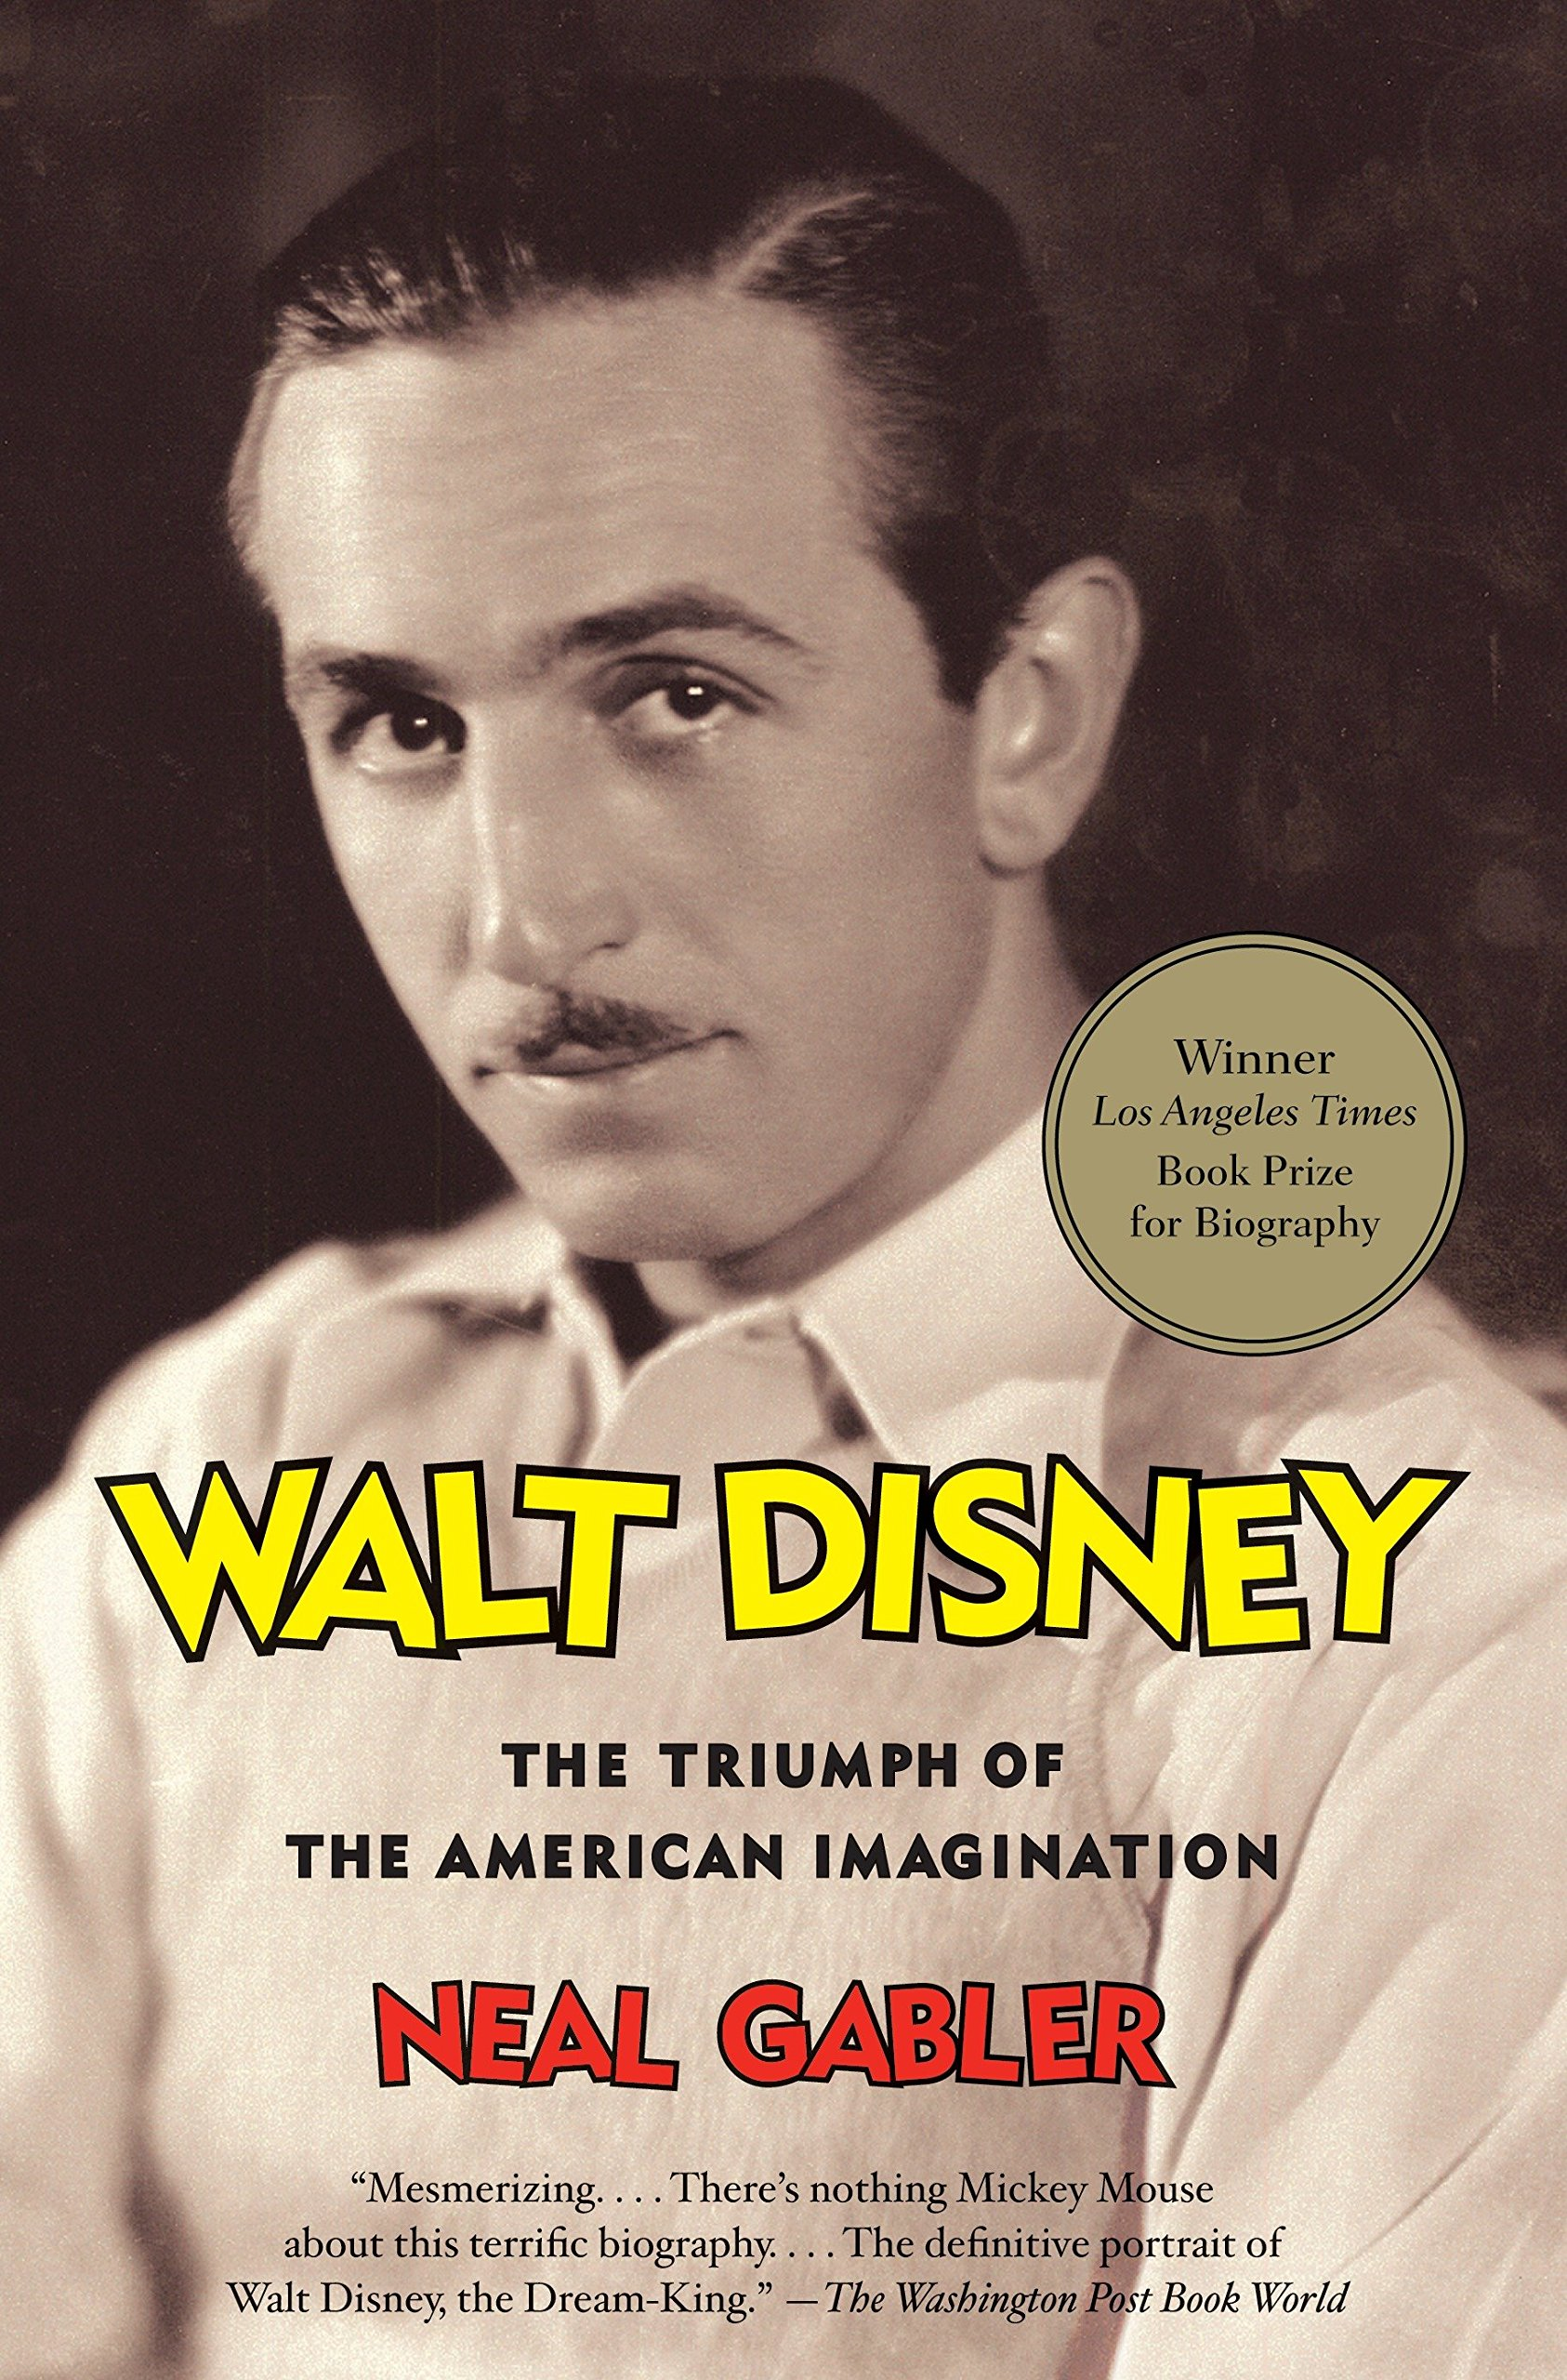 Book Cover of Walt Disney